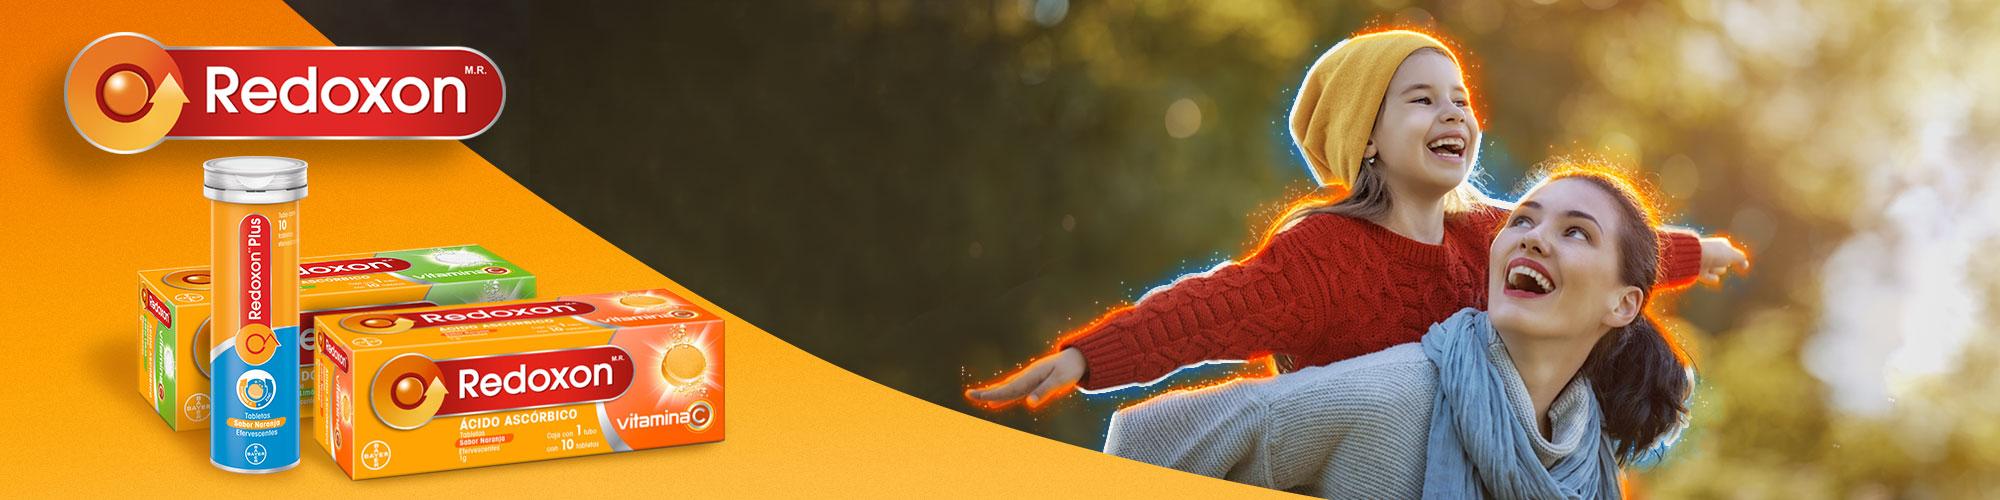 Redoxon Complejo Vitaminico Defensas